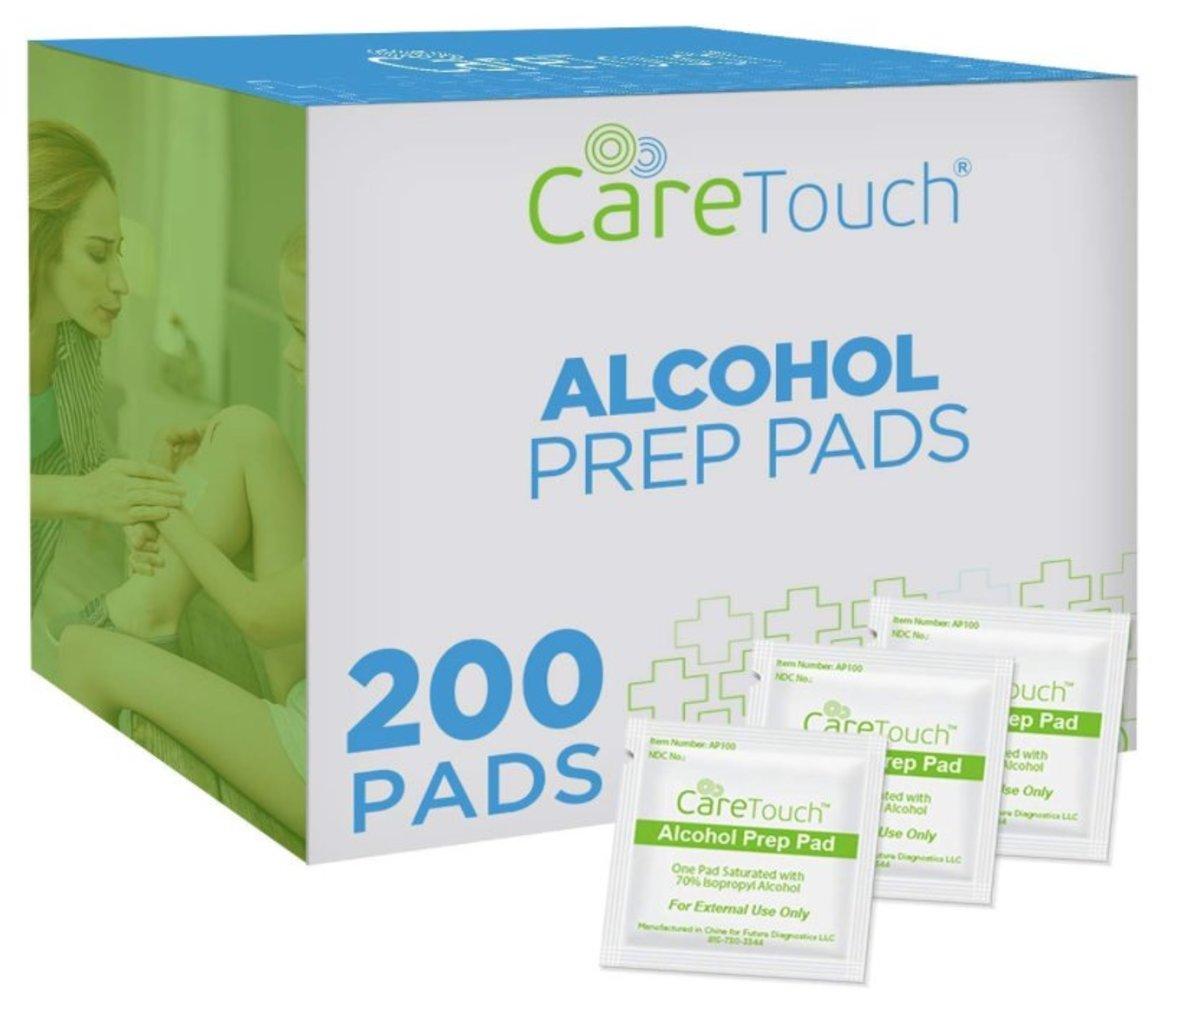 Care Touch 殺滅 99.99%細菌70%酒精- 酒精棉(Alcohol Pre Pads) - 美國平行進口 200 塊